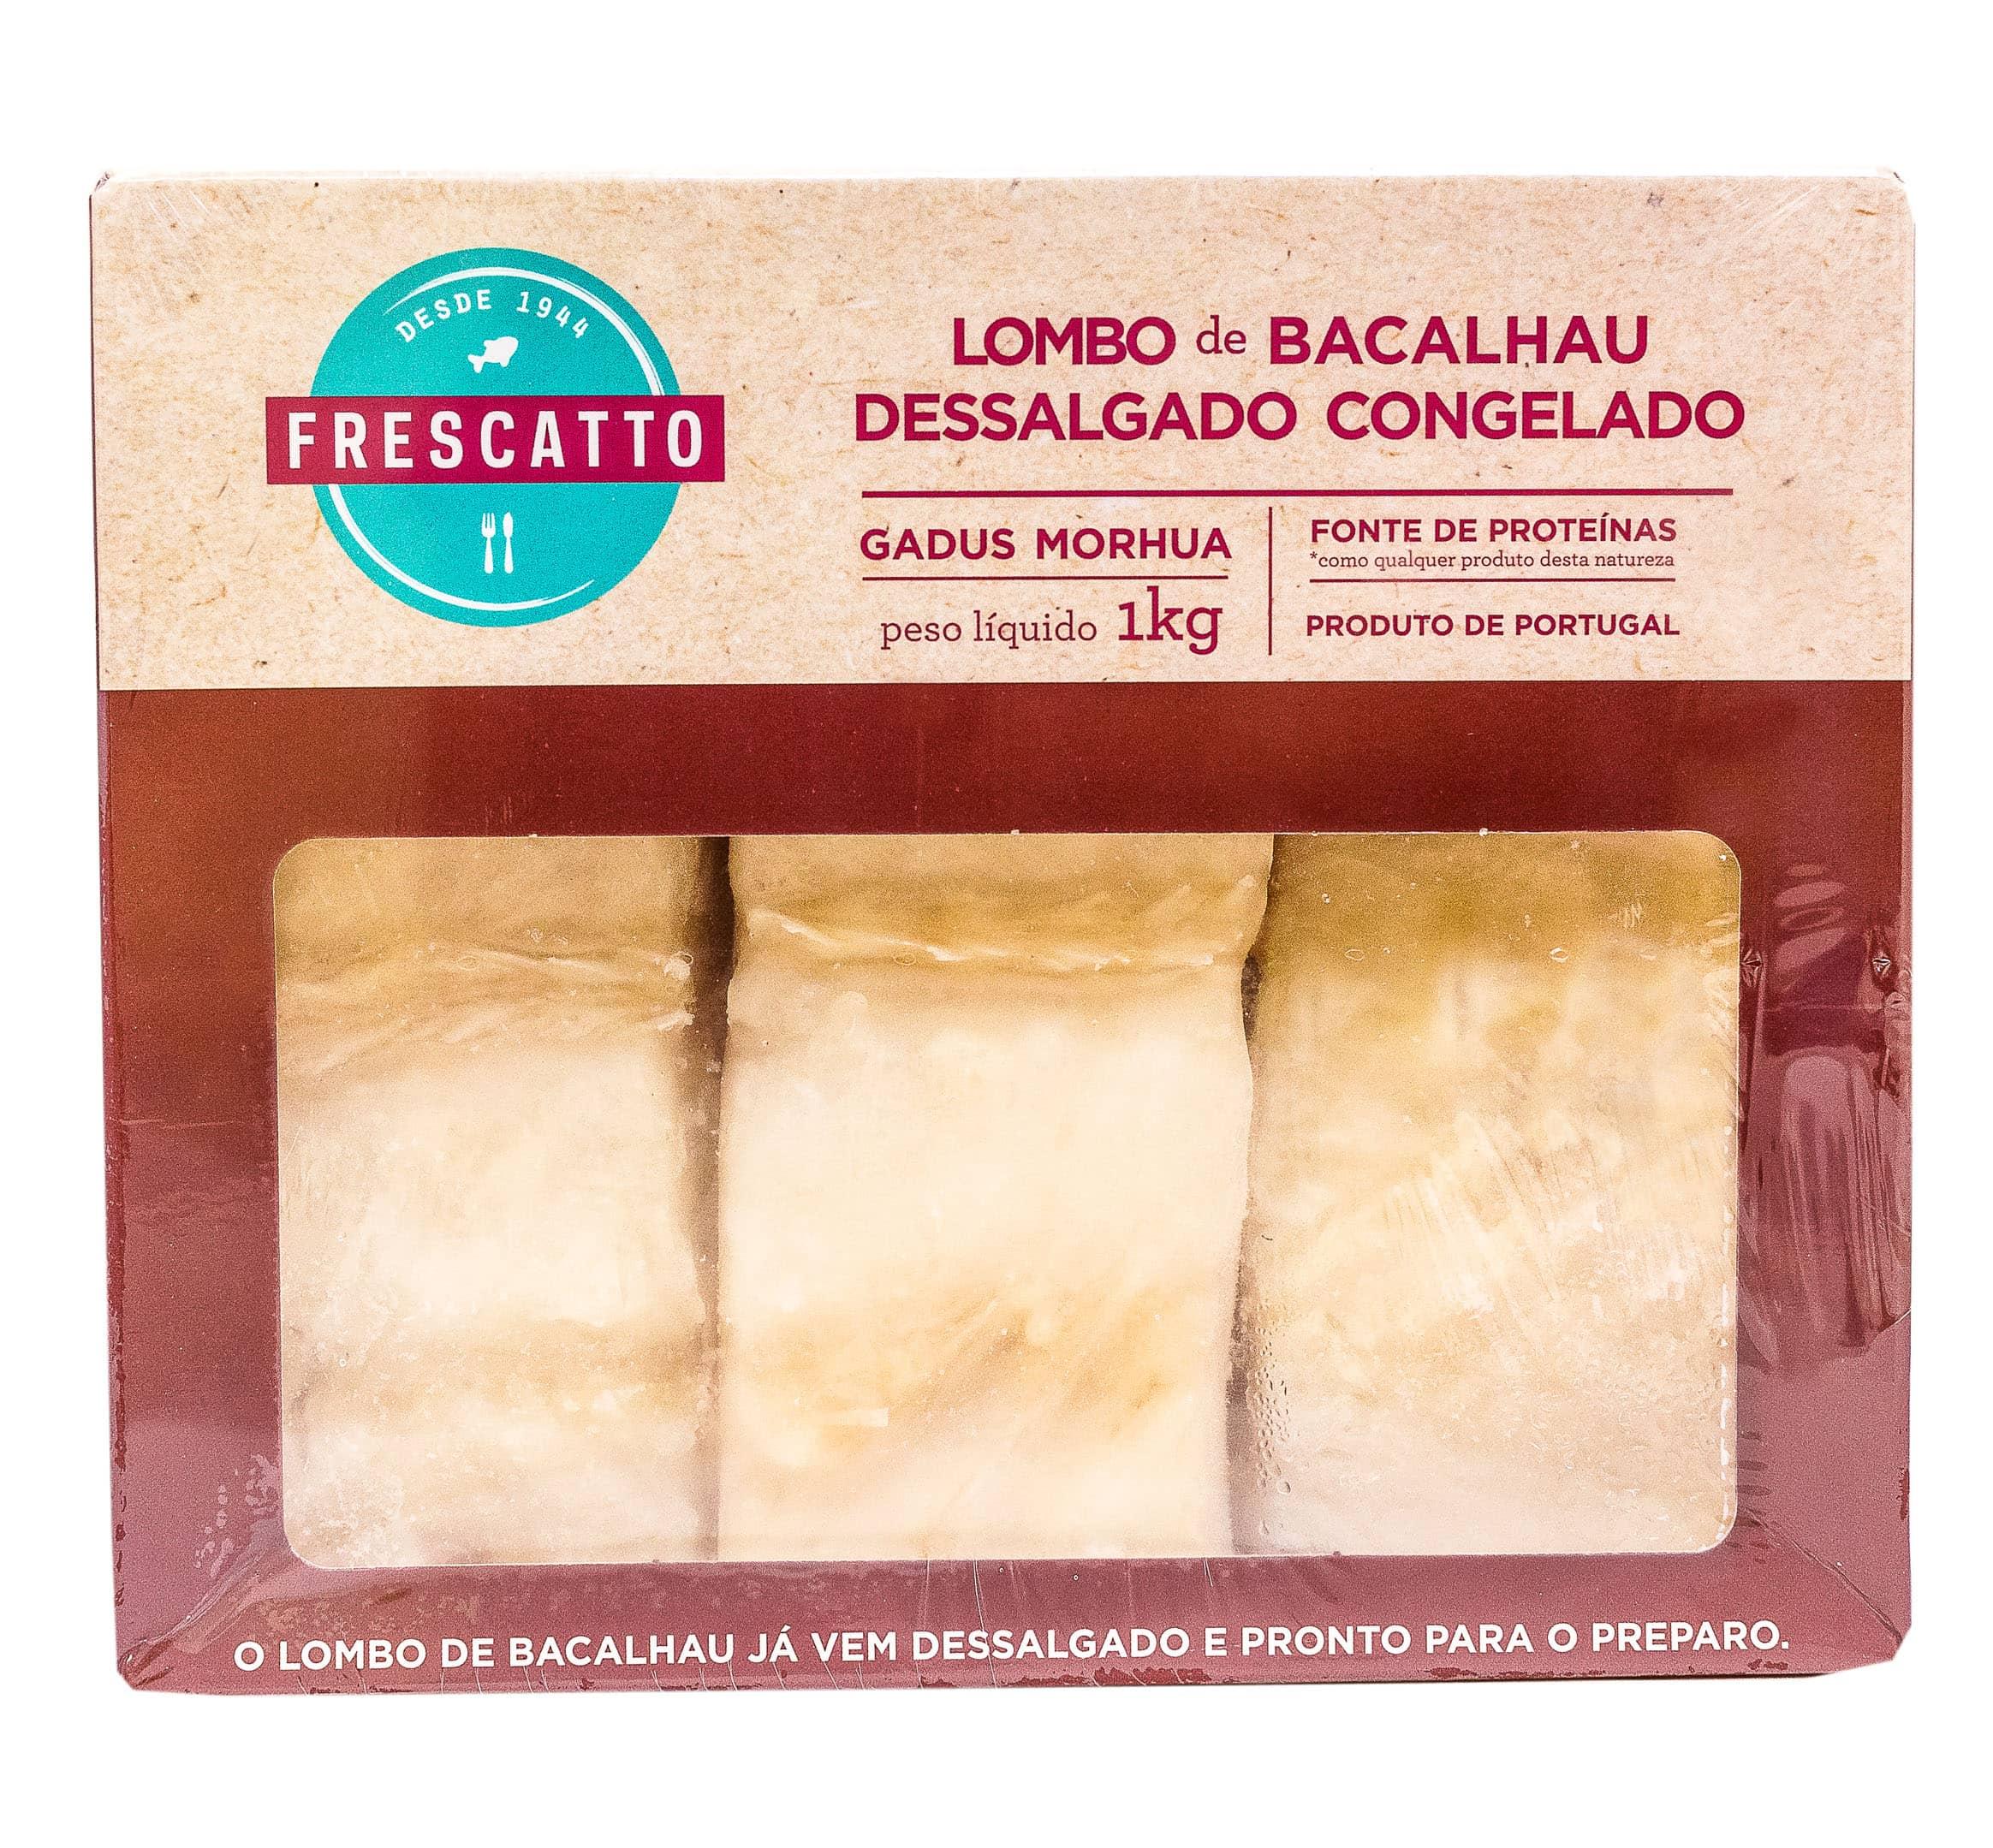 Lombo_Bacalhau_1kg_Premium-Frescatto